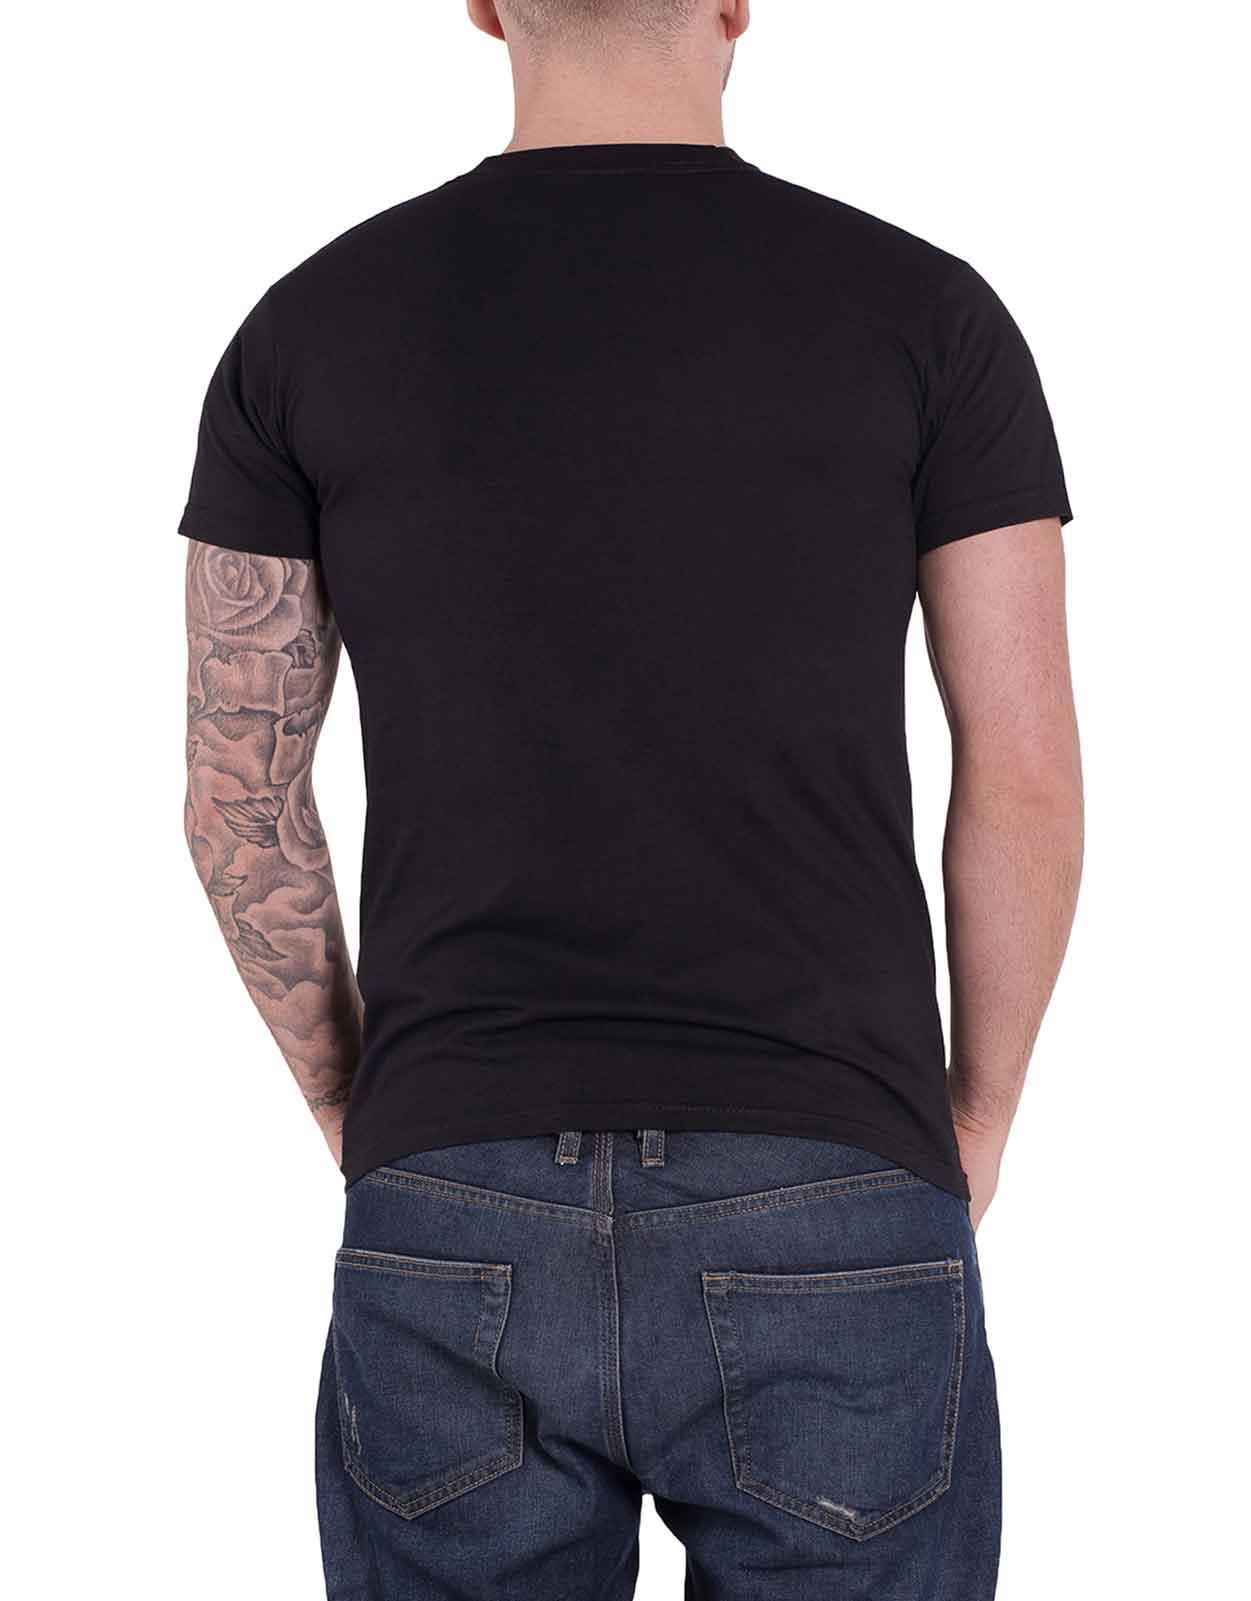 Official-Motley-Crue-T-Shirt-Shout-at-the-Devil-The-Dirt-Tour-Band-Logo-Mens thumbnail 43